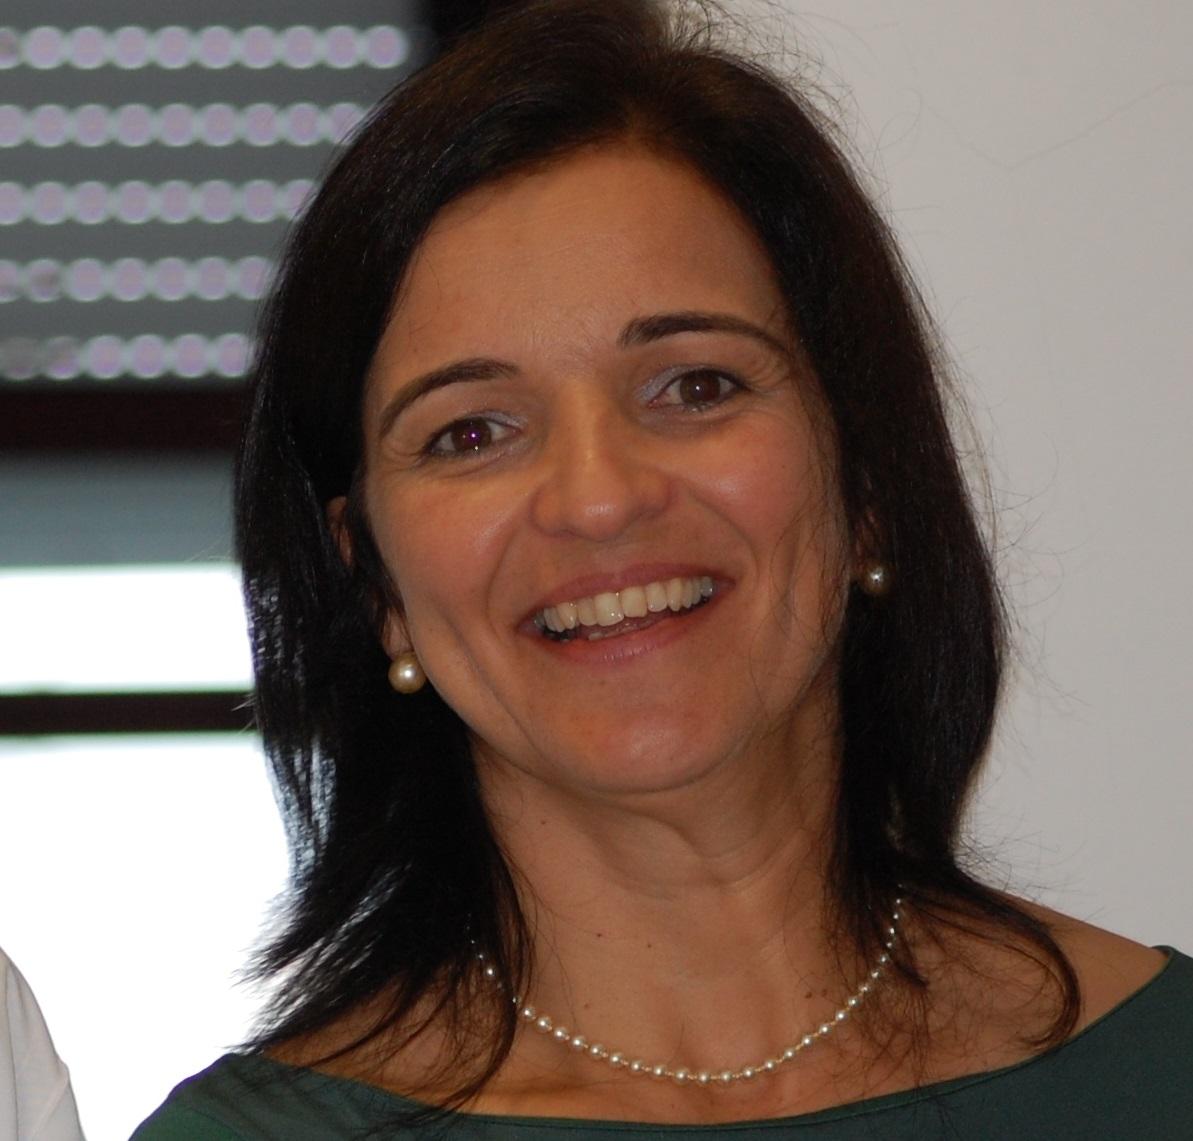 Maria Sofia Theriaga Mendes Varanda Gonçalves